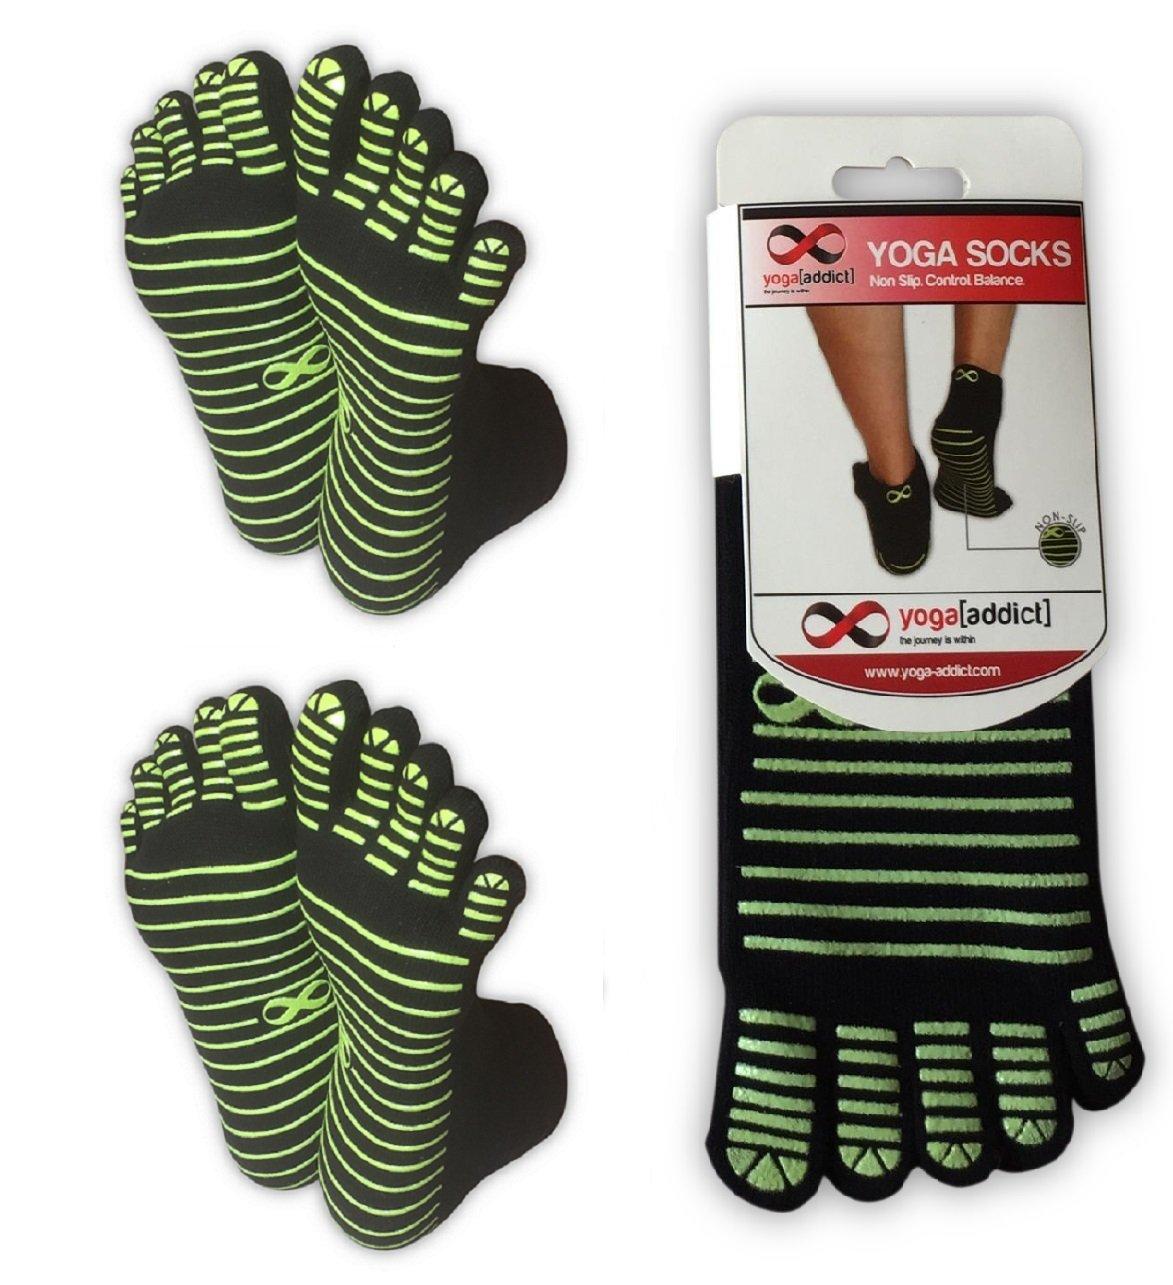 Fitness Home Use Non Slip Anti Skid Grip Socks, For Women /& Men Barre YogaAddict Yoga Pilates Full Toe Socks 1 or 2 Pairs Set Choose Your Colours Trampoline Workout Dance